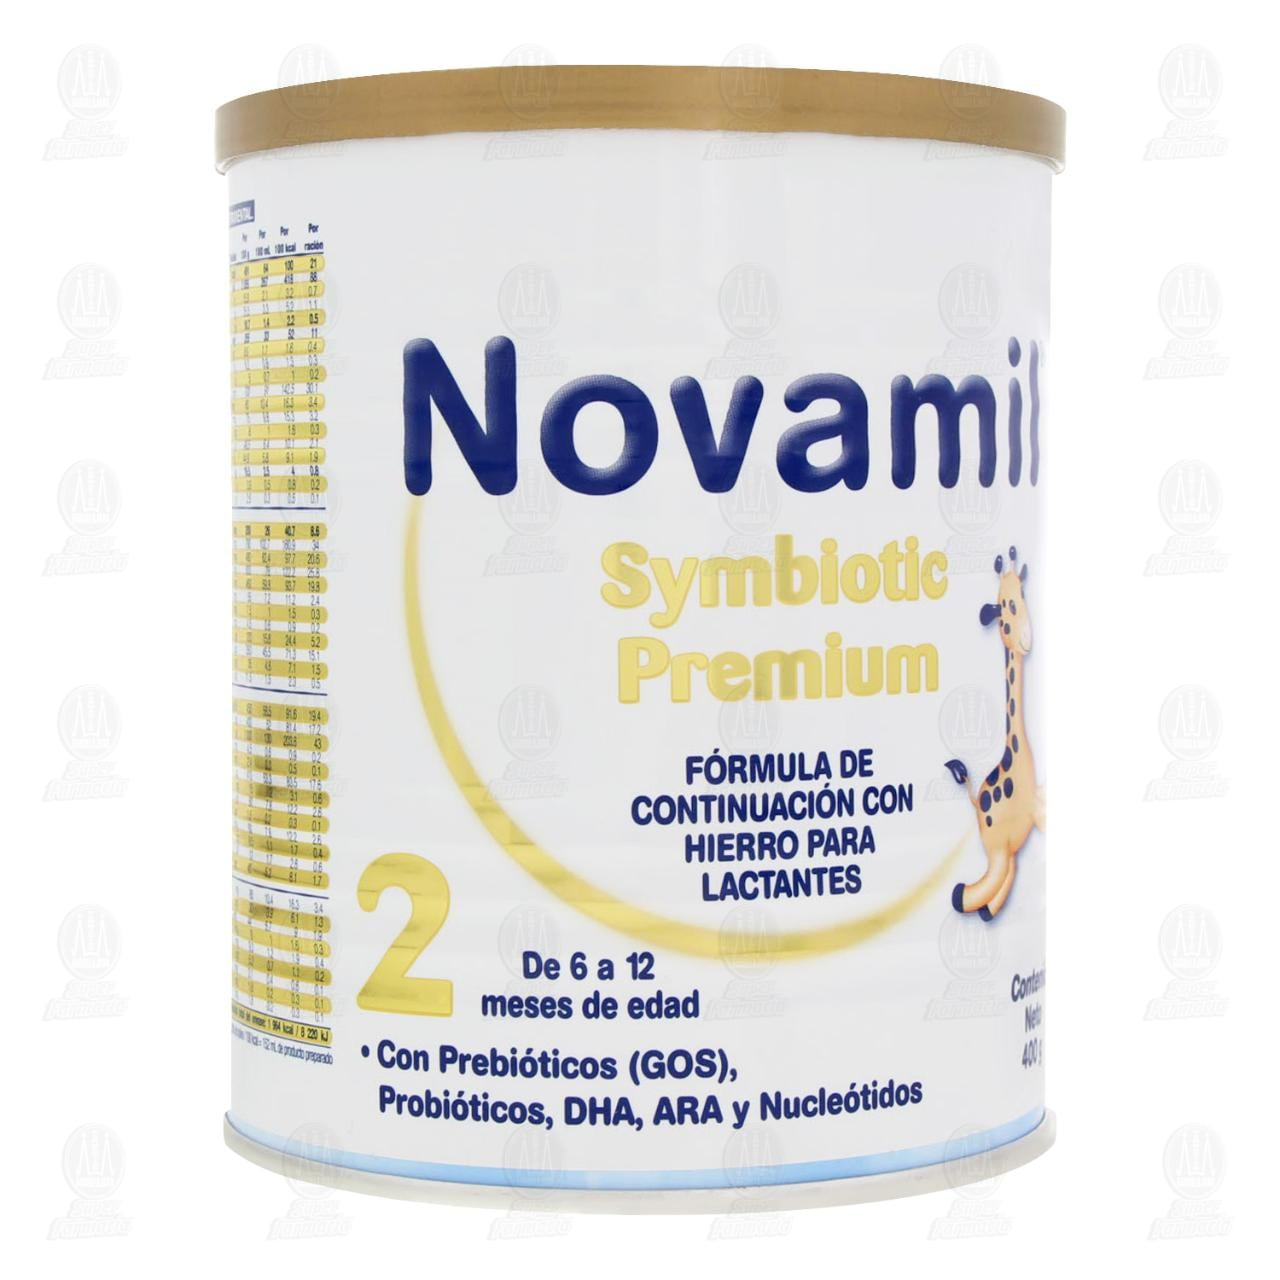 Comprar Fórmula Láctea Novamil Symbiotic Premium Etapa 2 en Polvo (Edad 6-12 Meses), 400 gr. en Farmacias Guadalajara